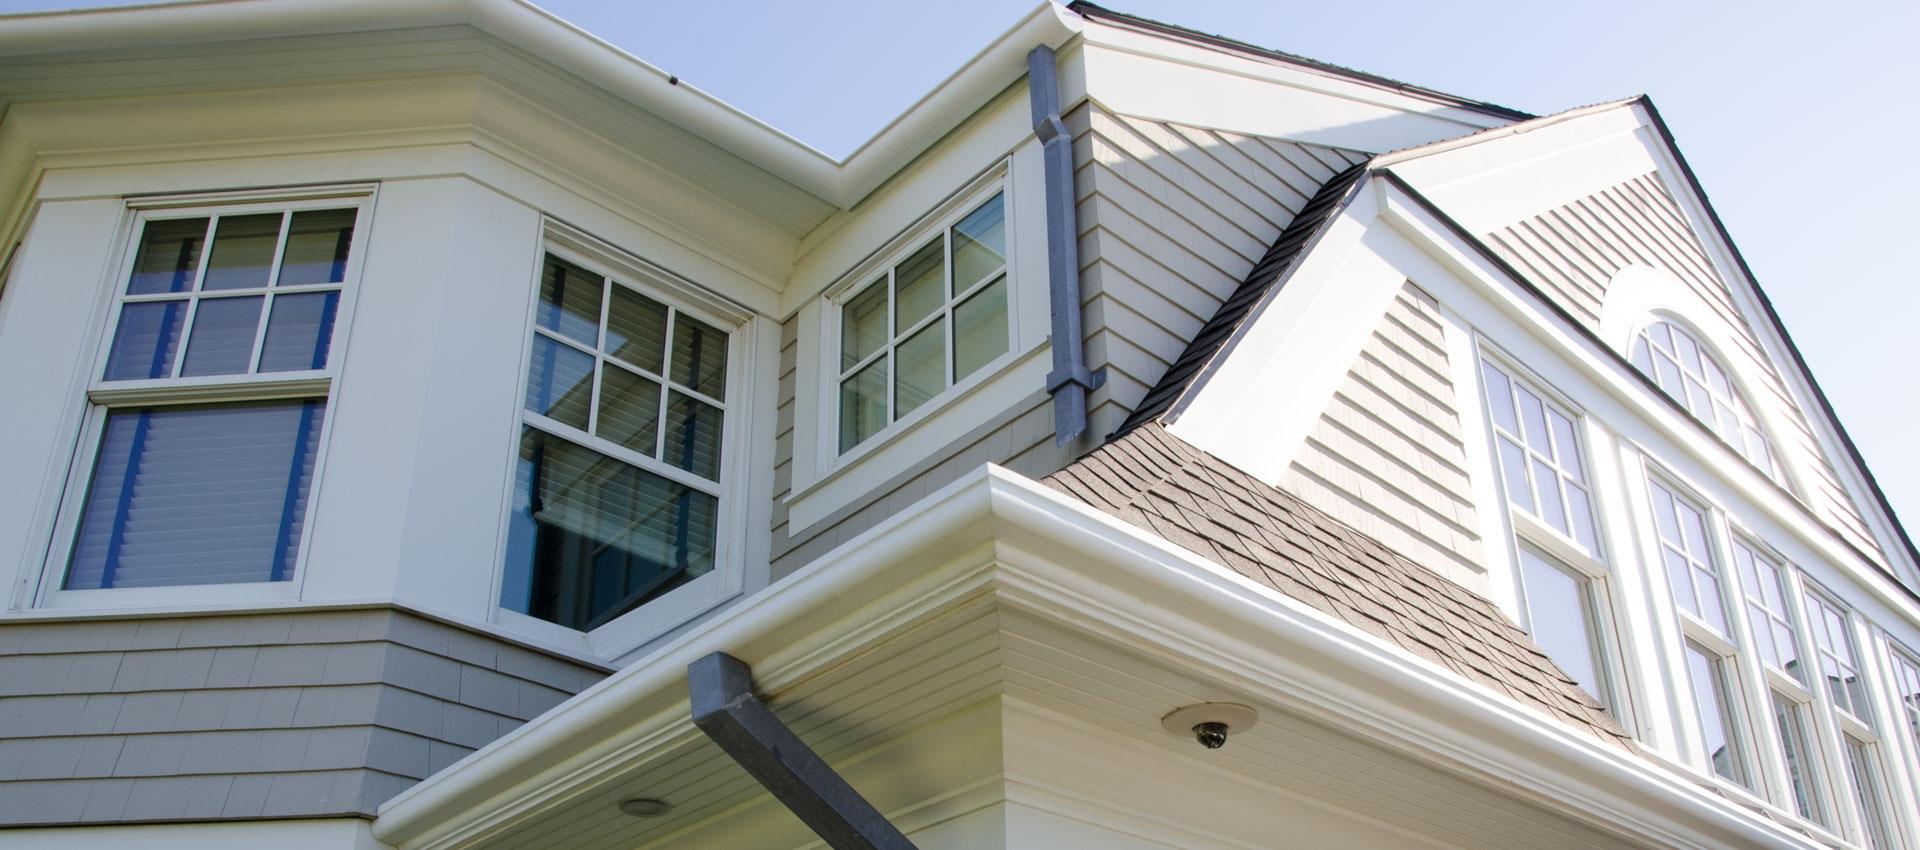 New Home Construction In Narragansett, RI From Mack Construction